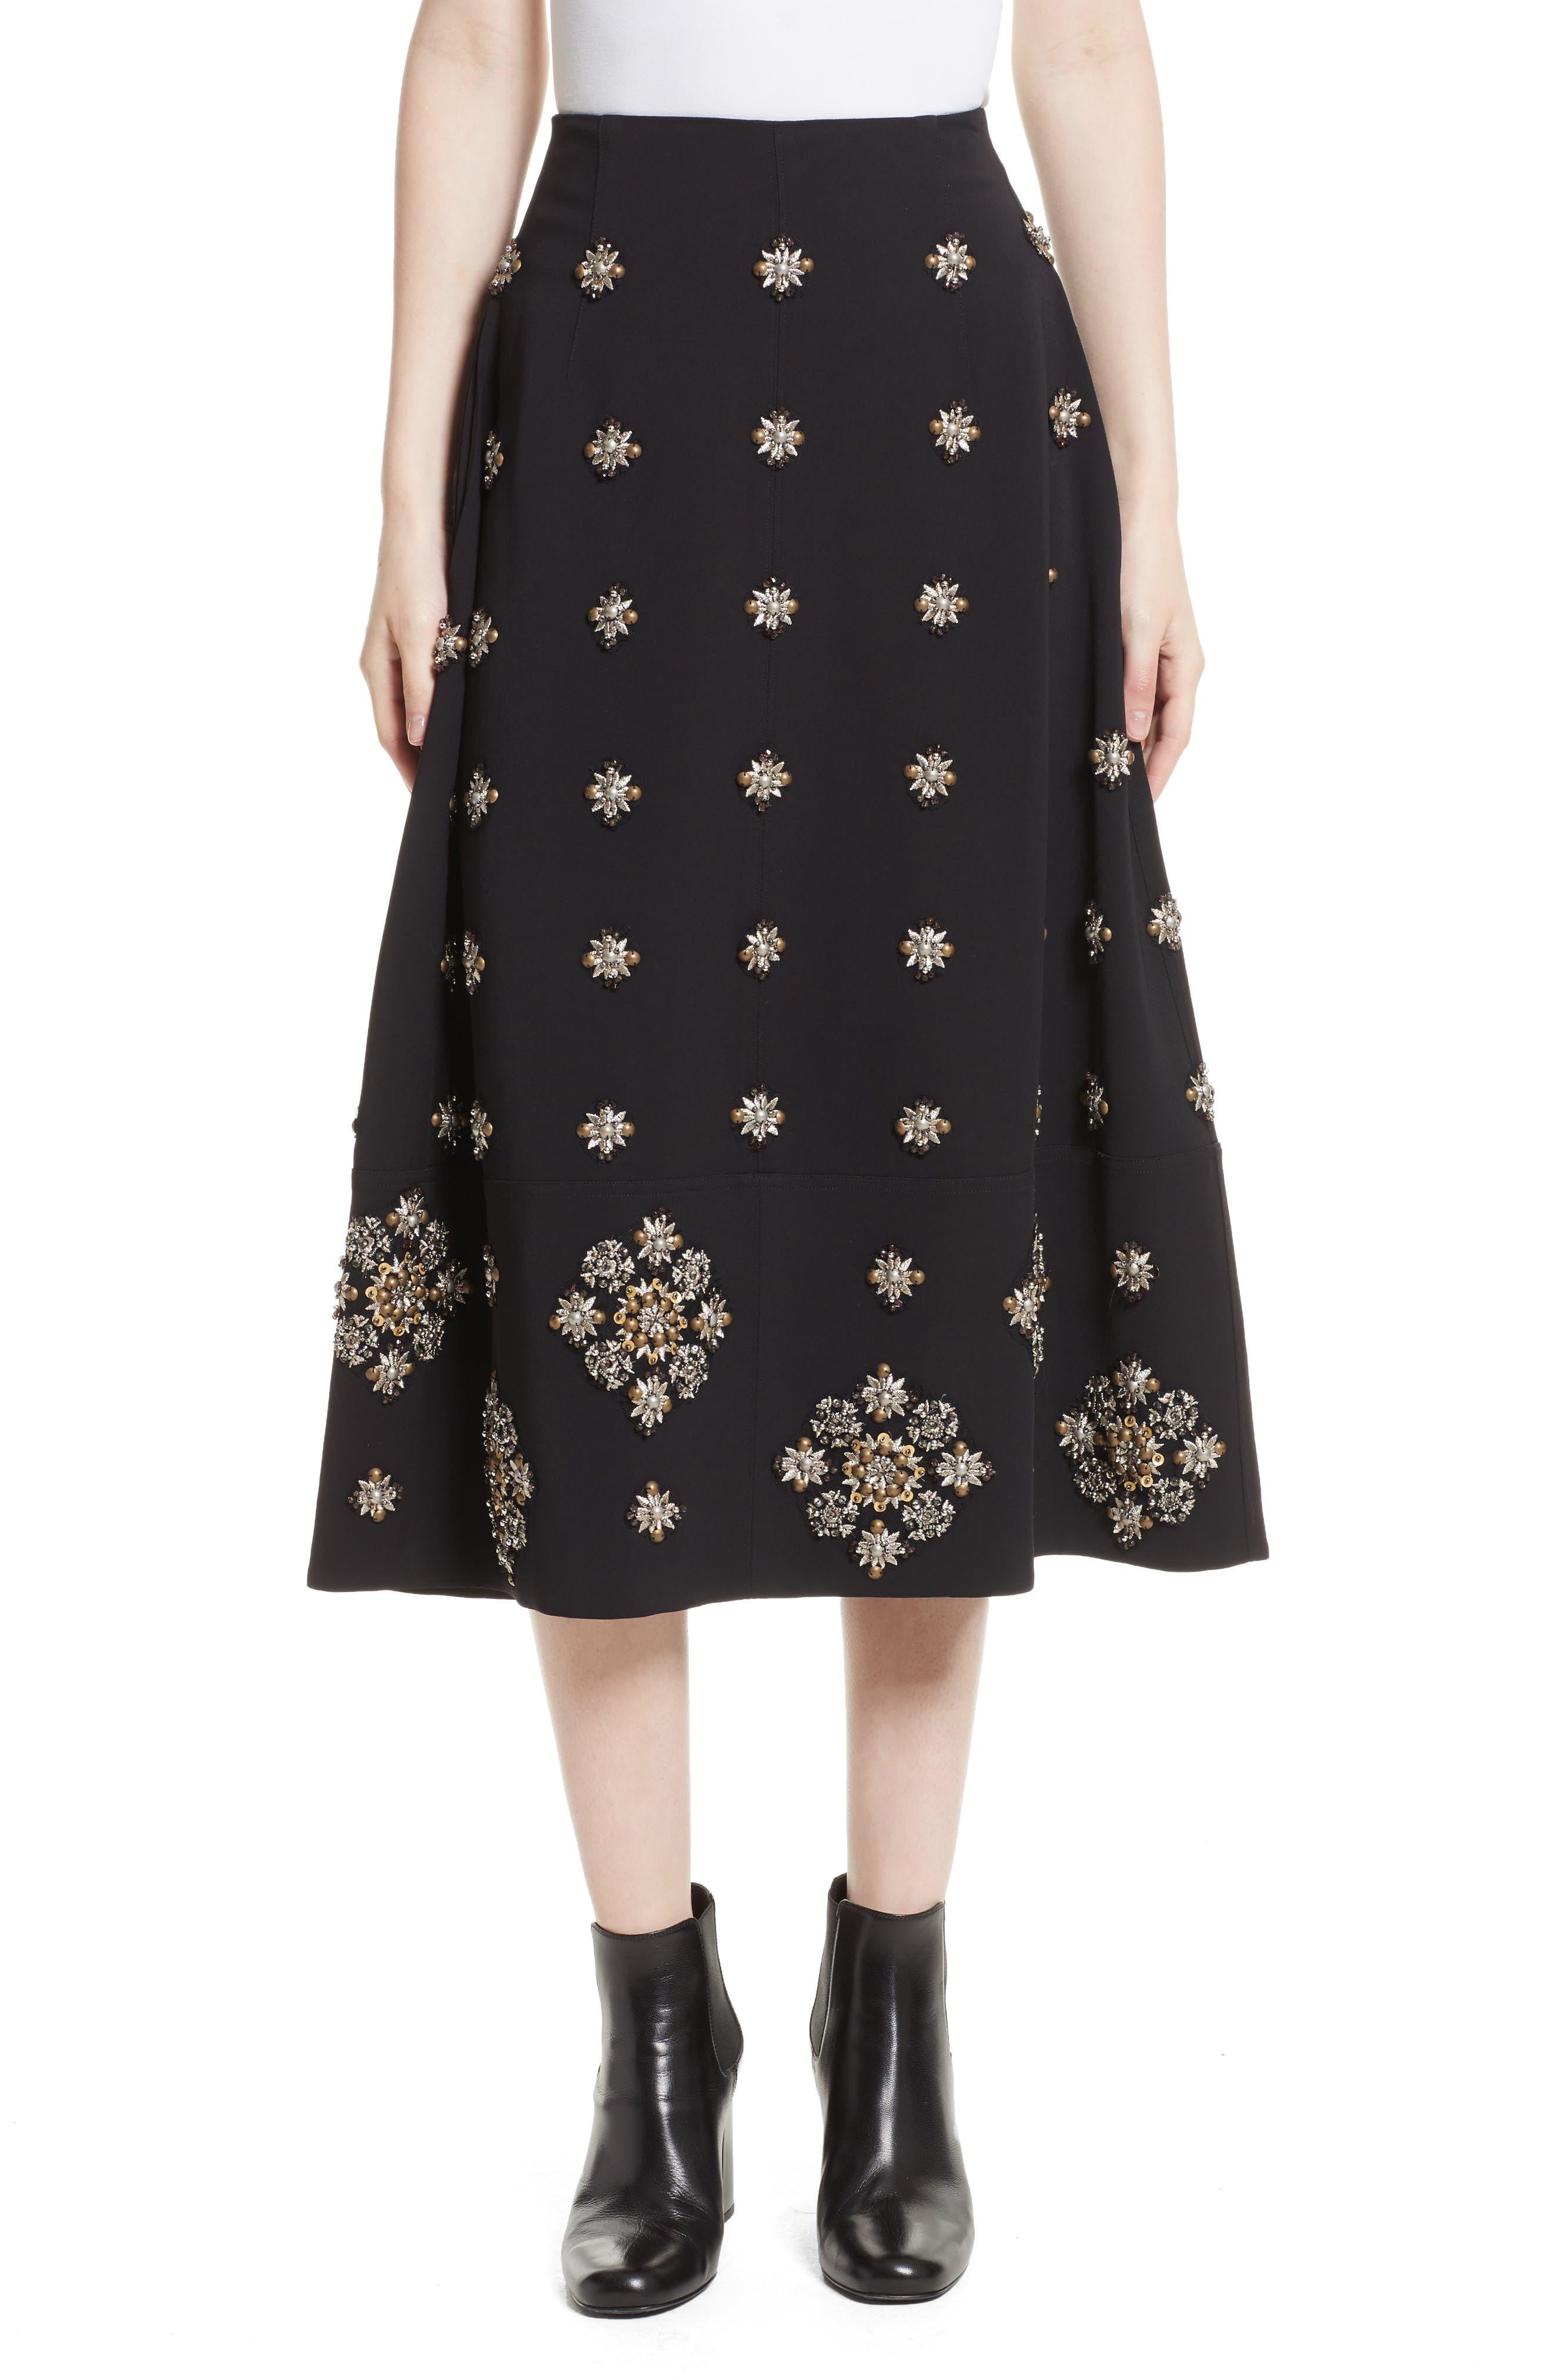 Elizabeth and James Lottie Embellished Midi Skirt